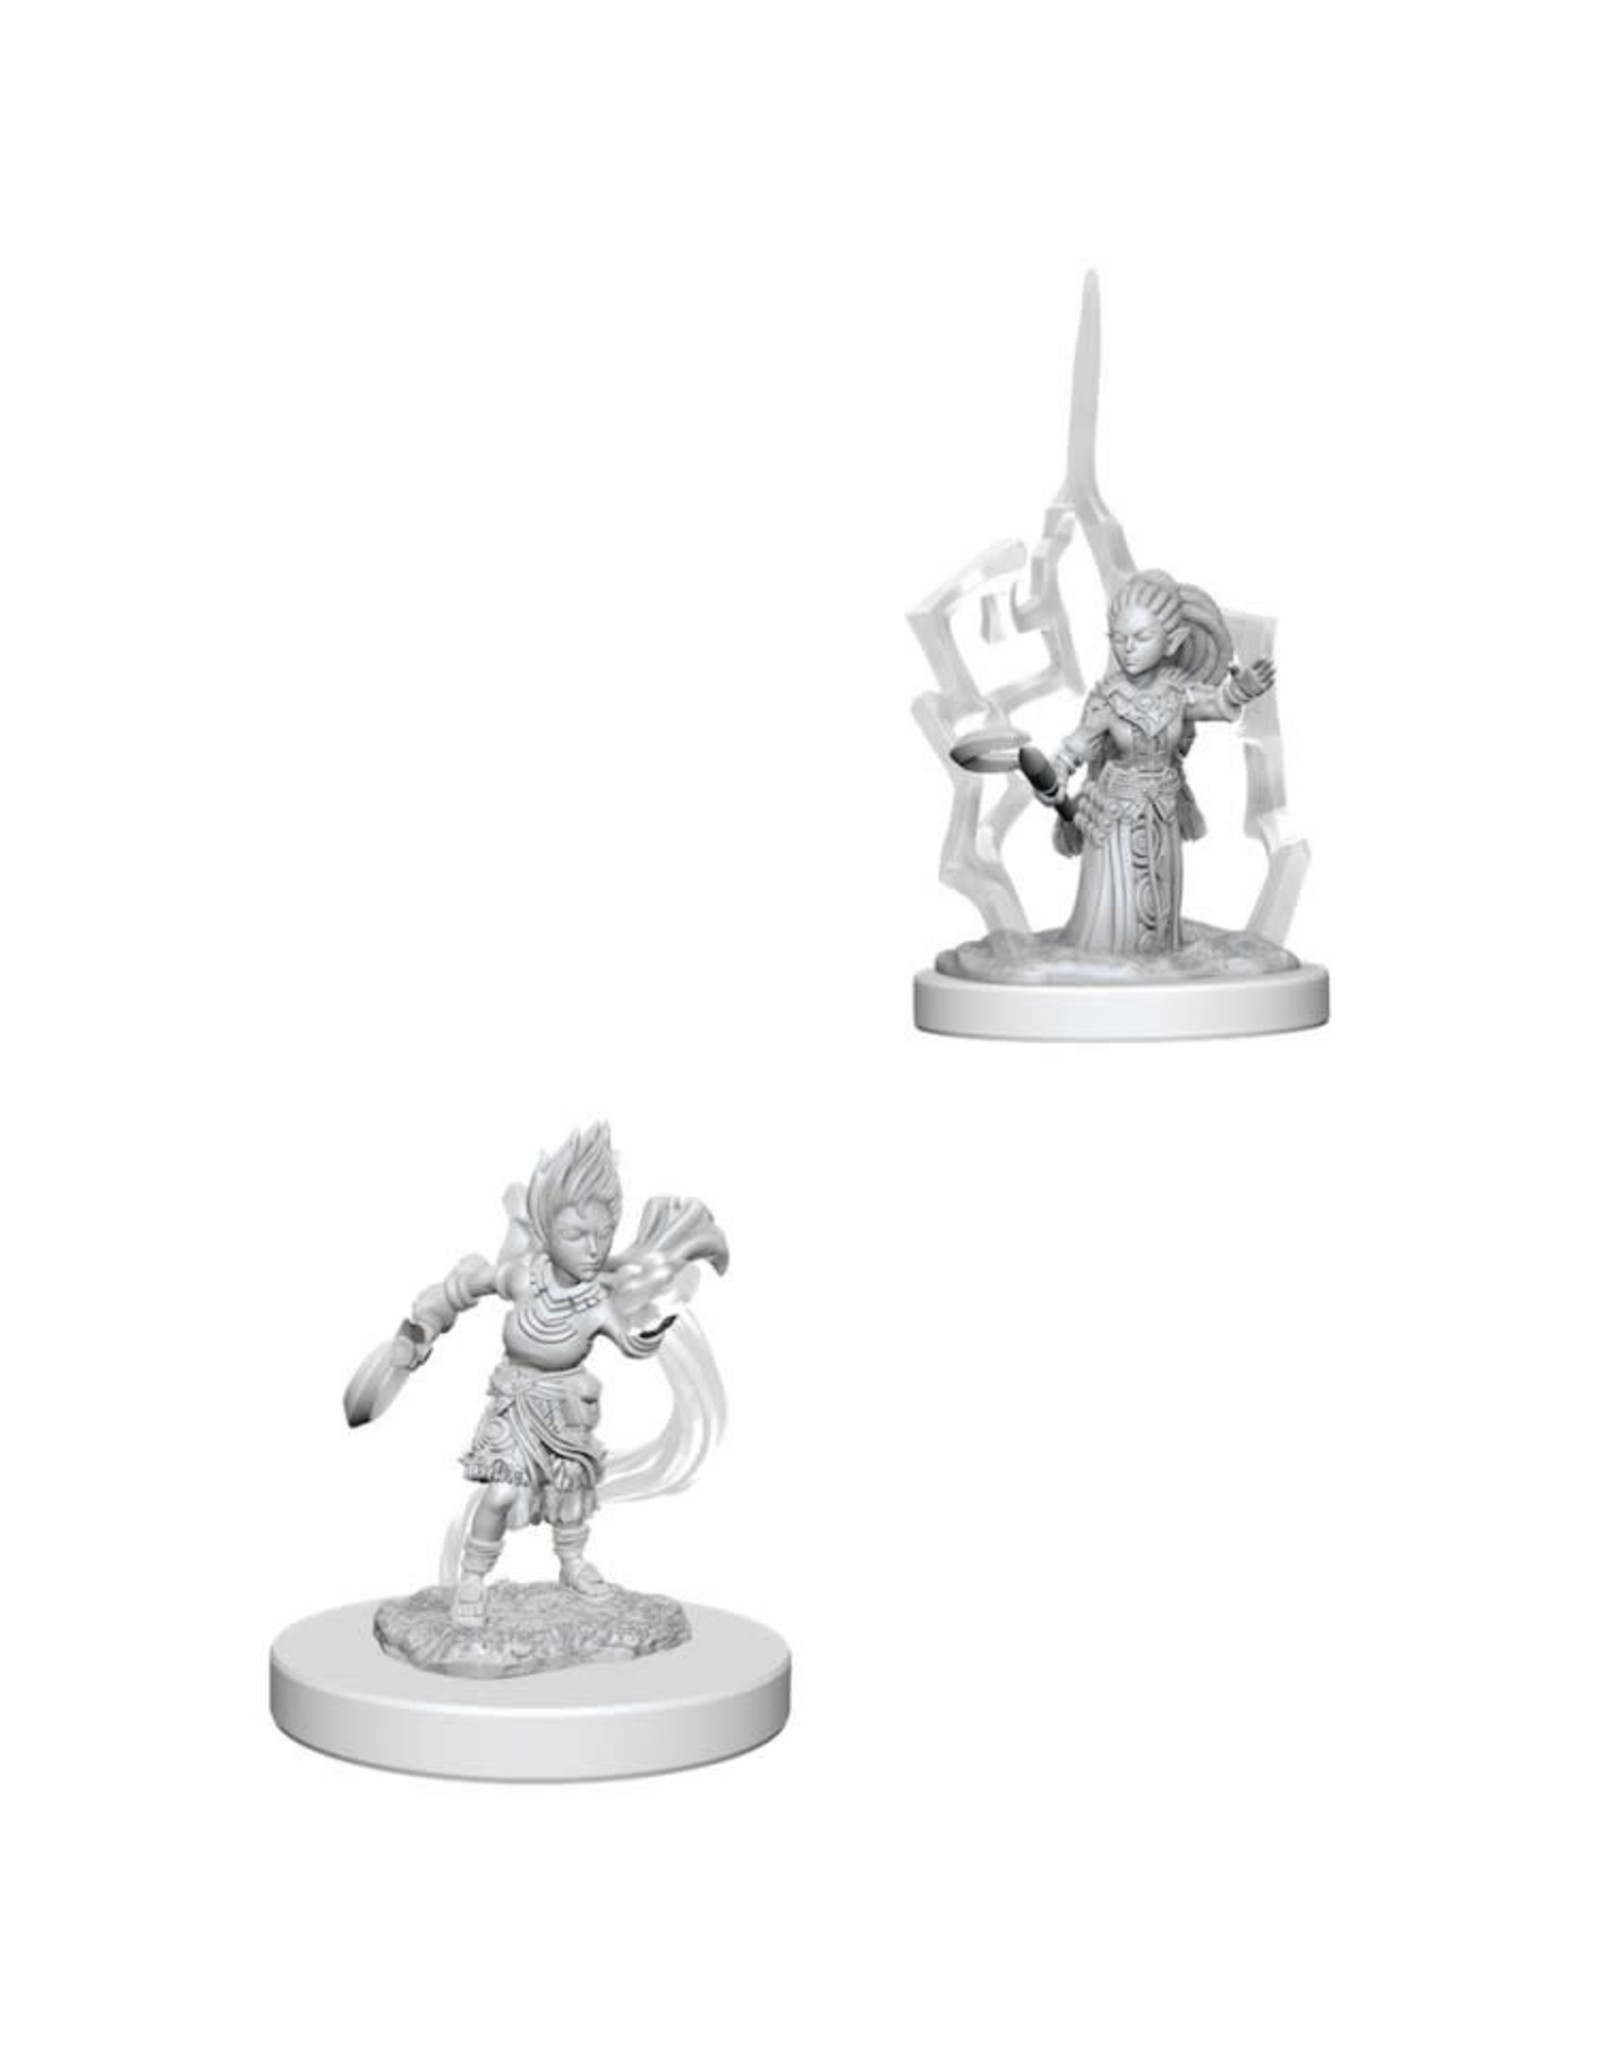 WizKids Pathfinder Minis (unpainted): Gnome Druid (female) Wave 5, 73347